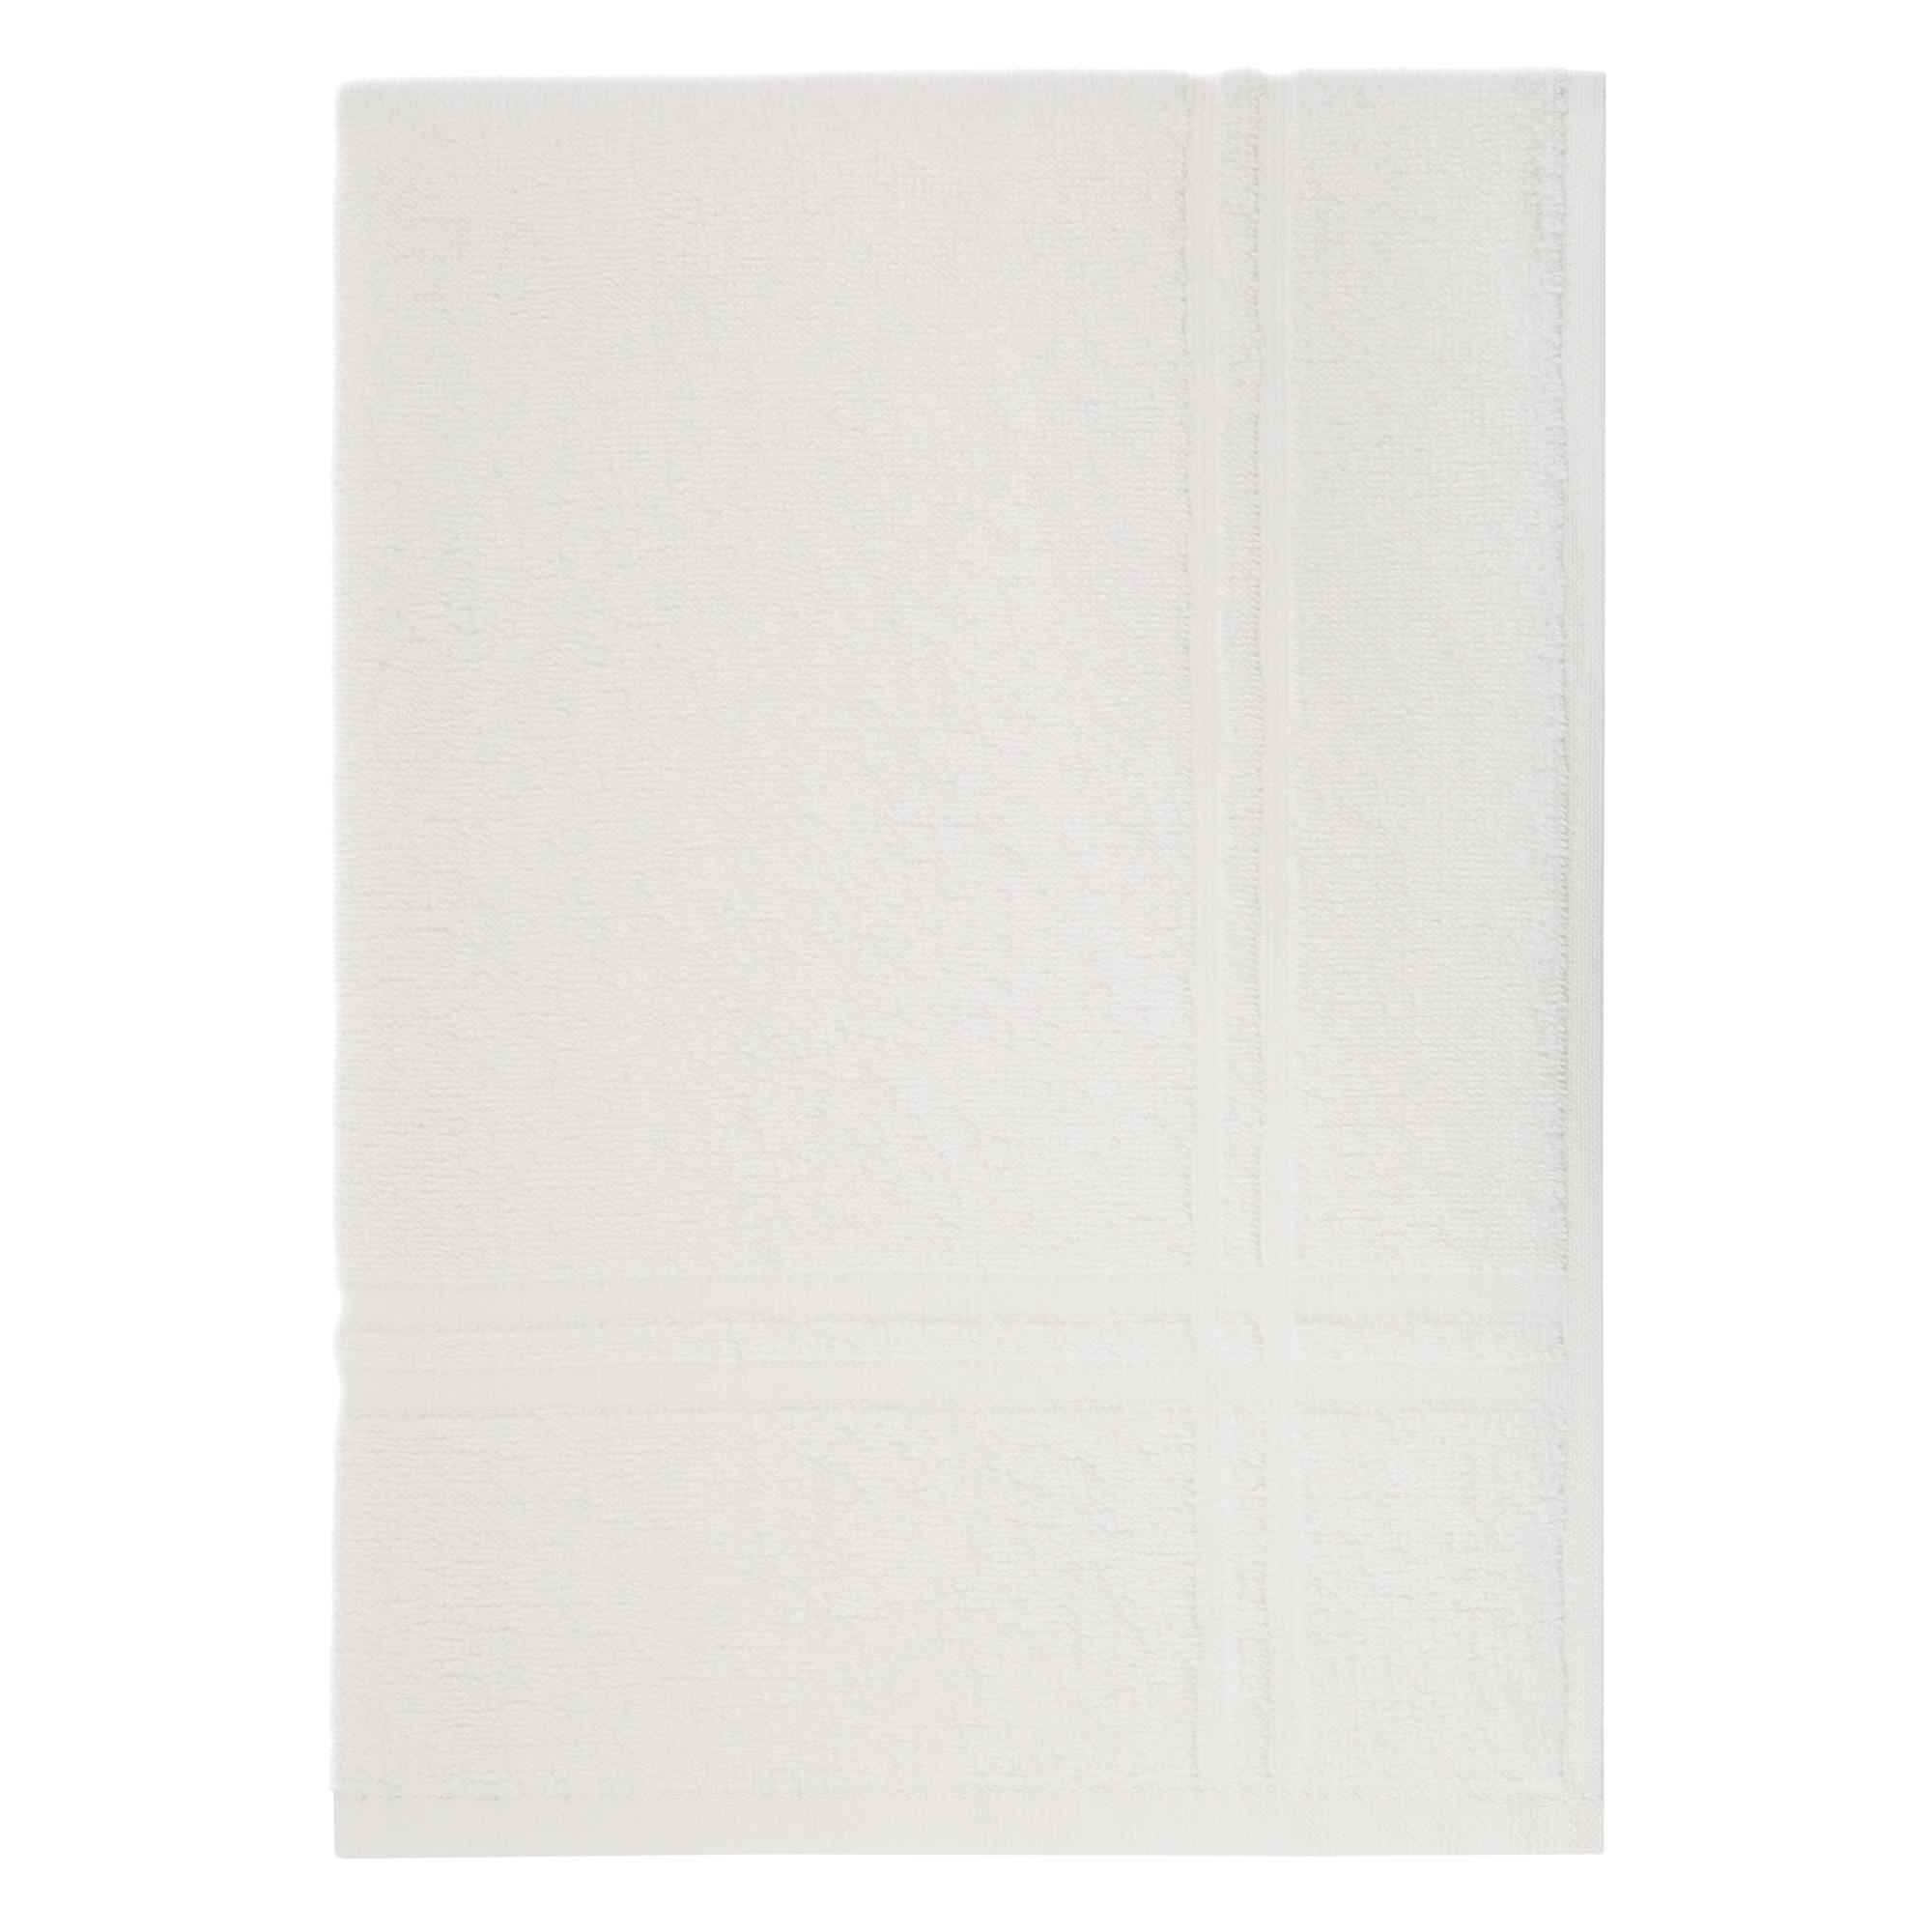 Toalha de Piso Metropole 45x65cm 100 algodao Branco - Karsten